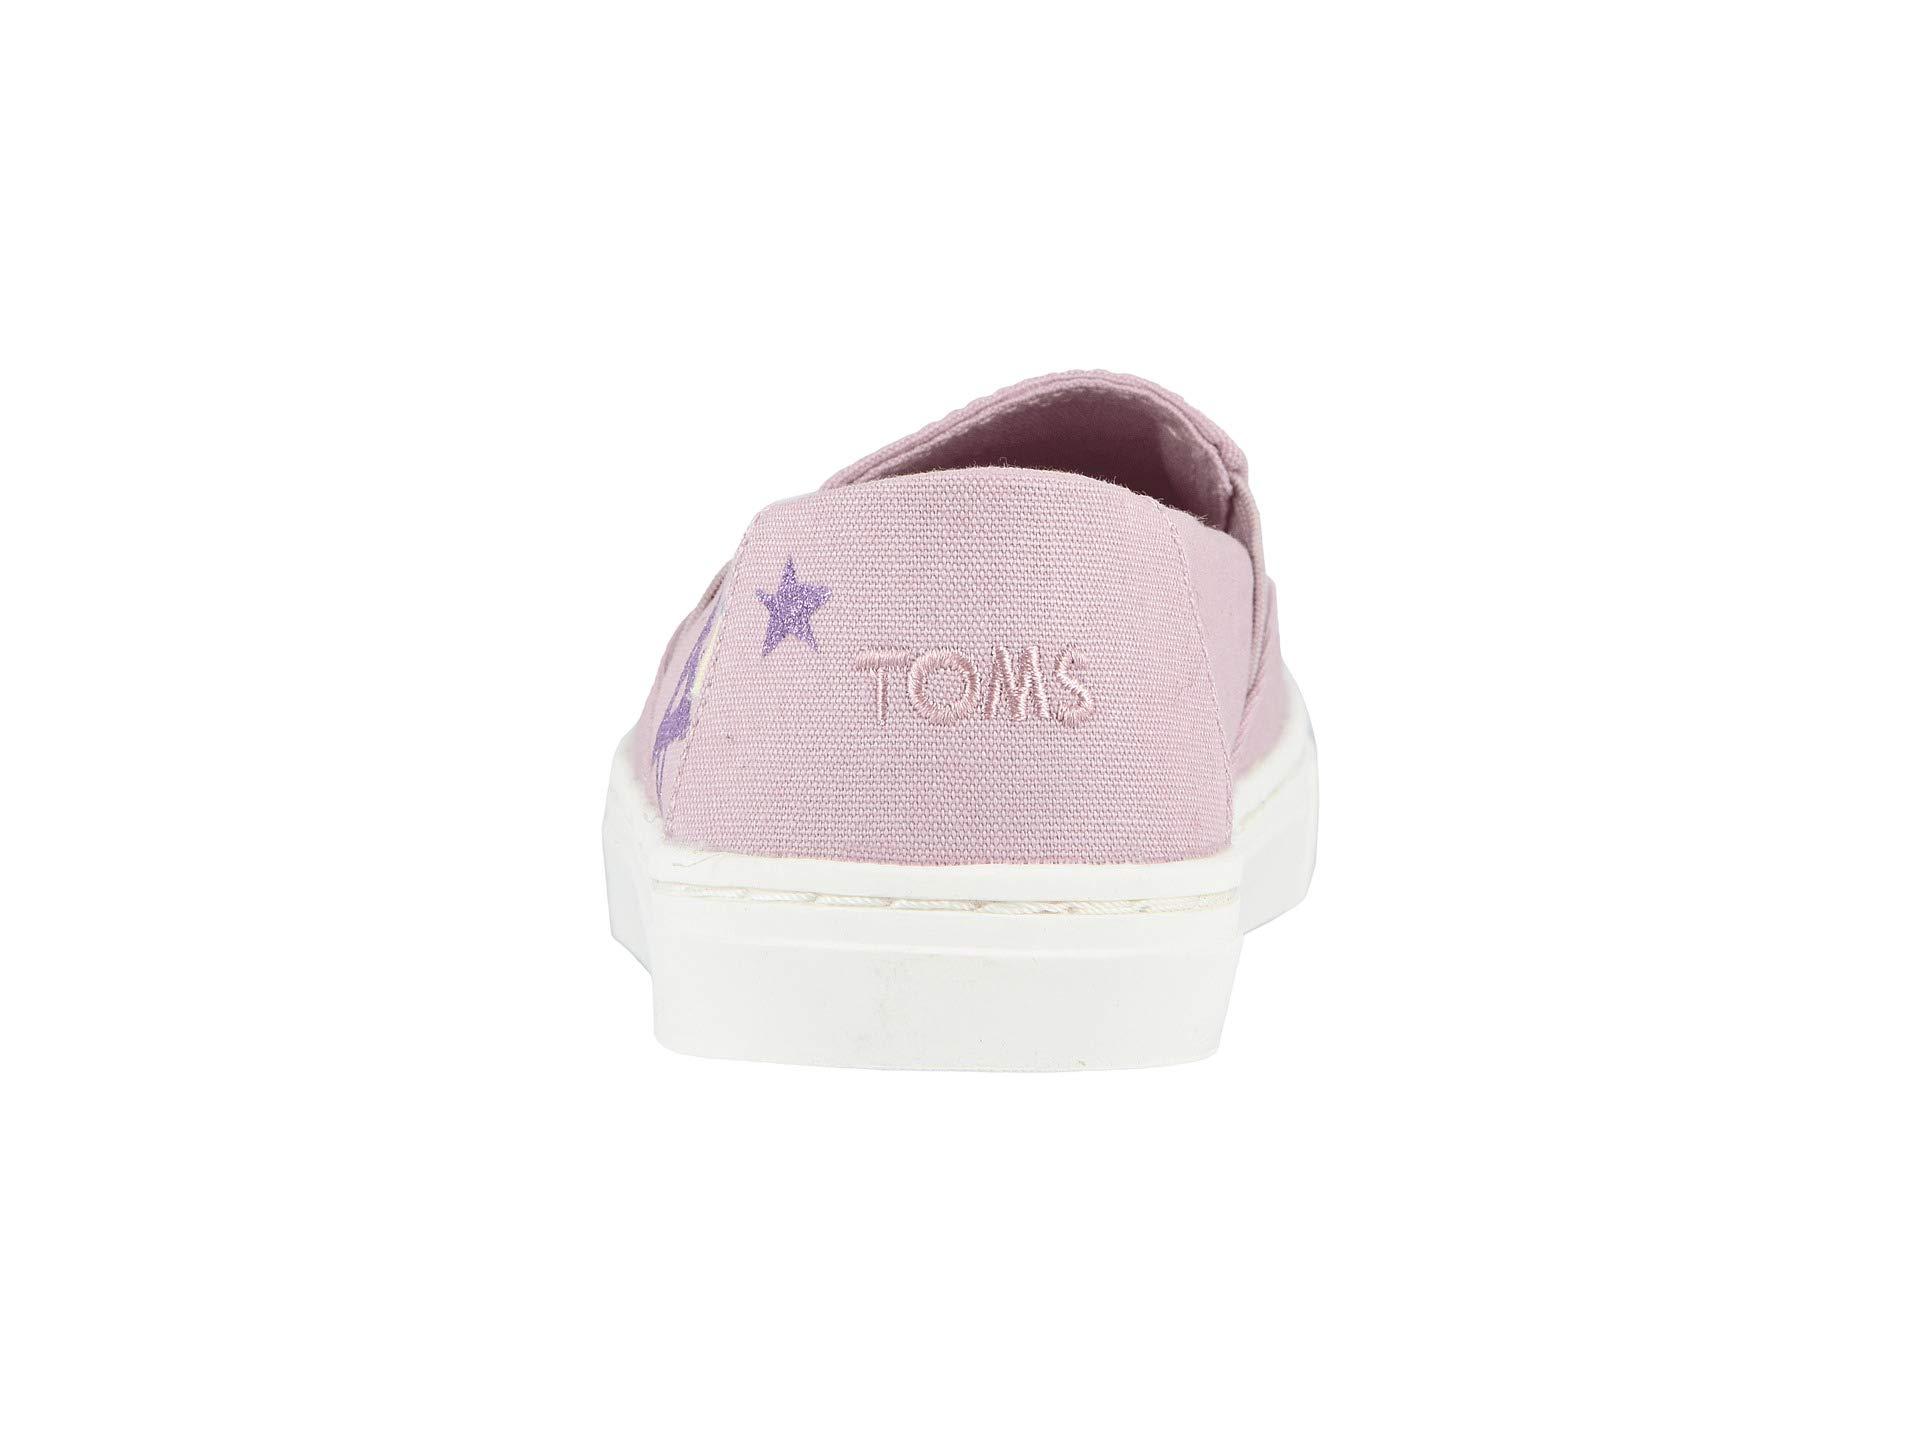 TOMS Youth Luca Slip-On Shoes, Size: 3.5 M US Big Kid, Color: Brnsh Lilac Glt Star by TOMS Kids (Image #3)